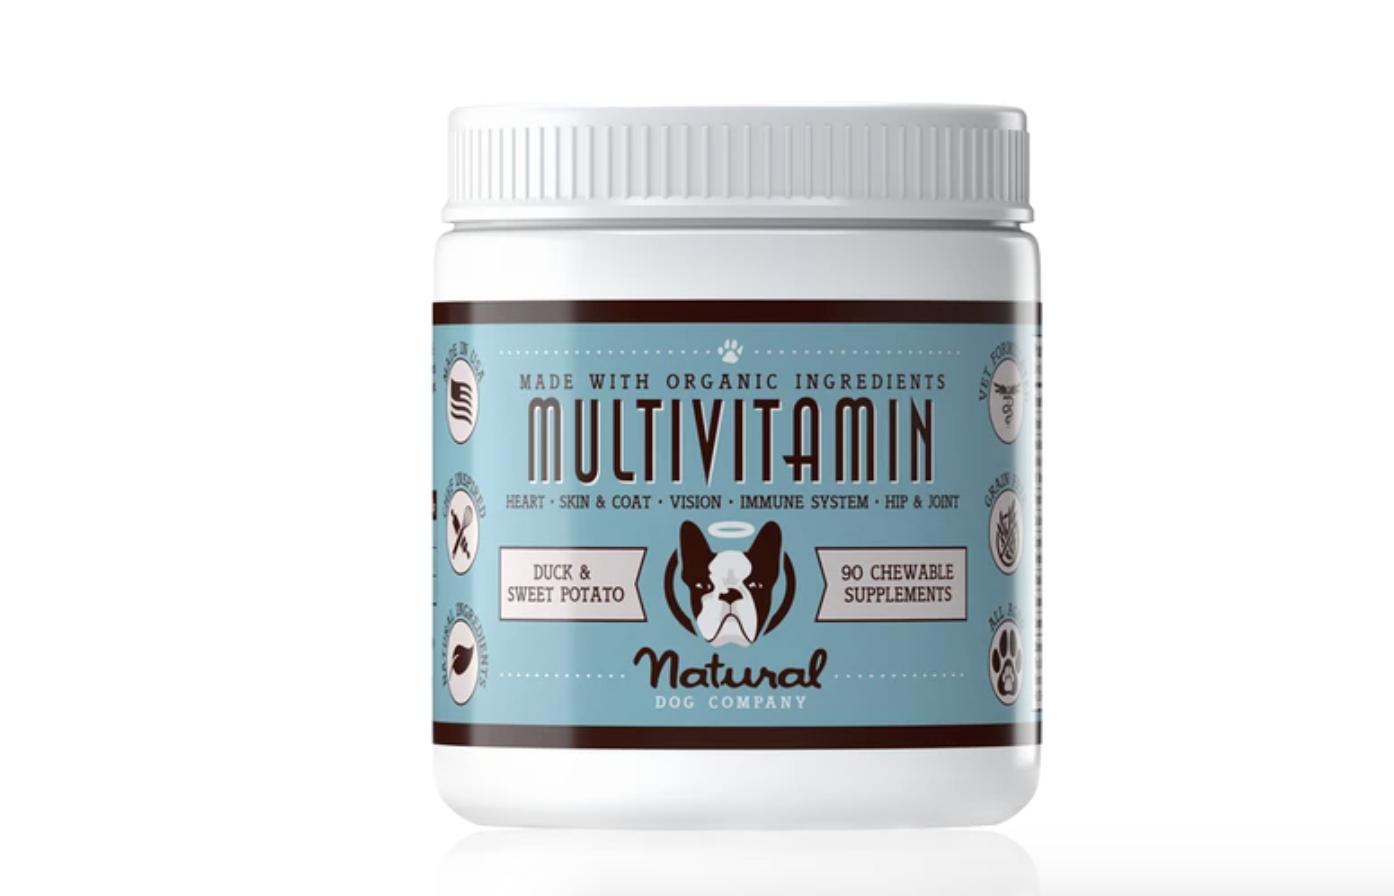 Multivitamin - Natural Dog Company